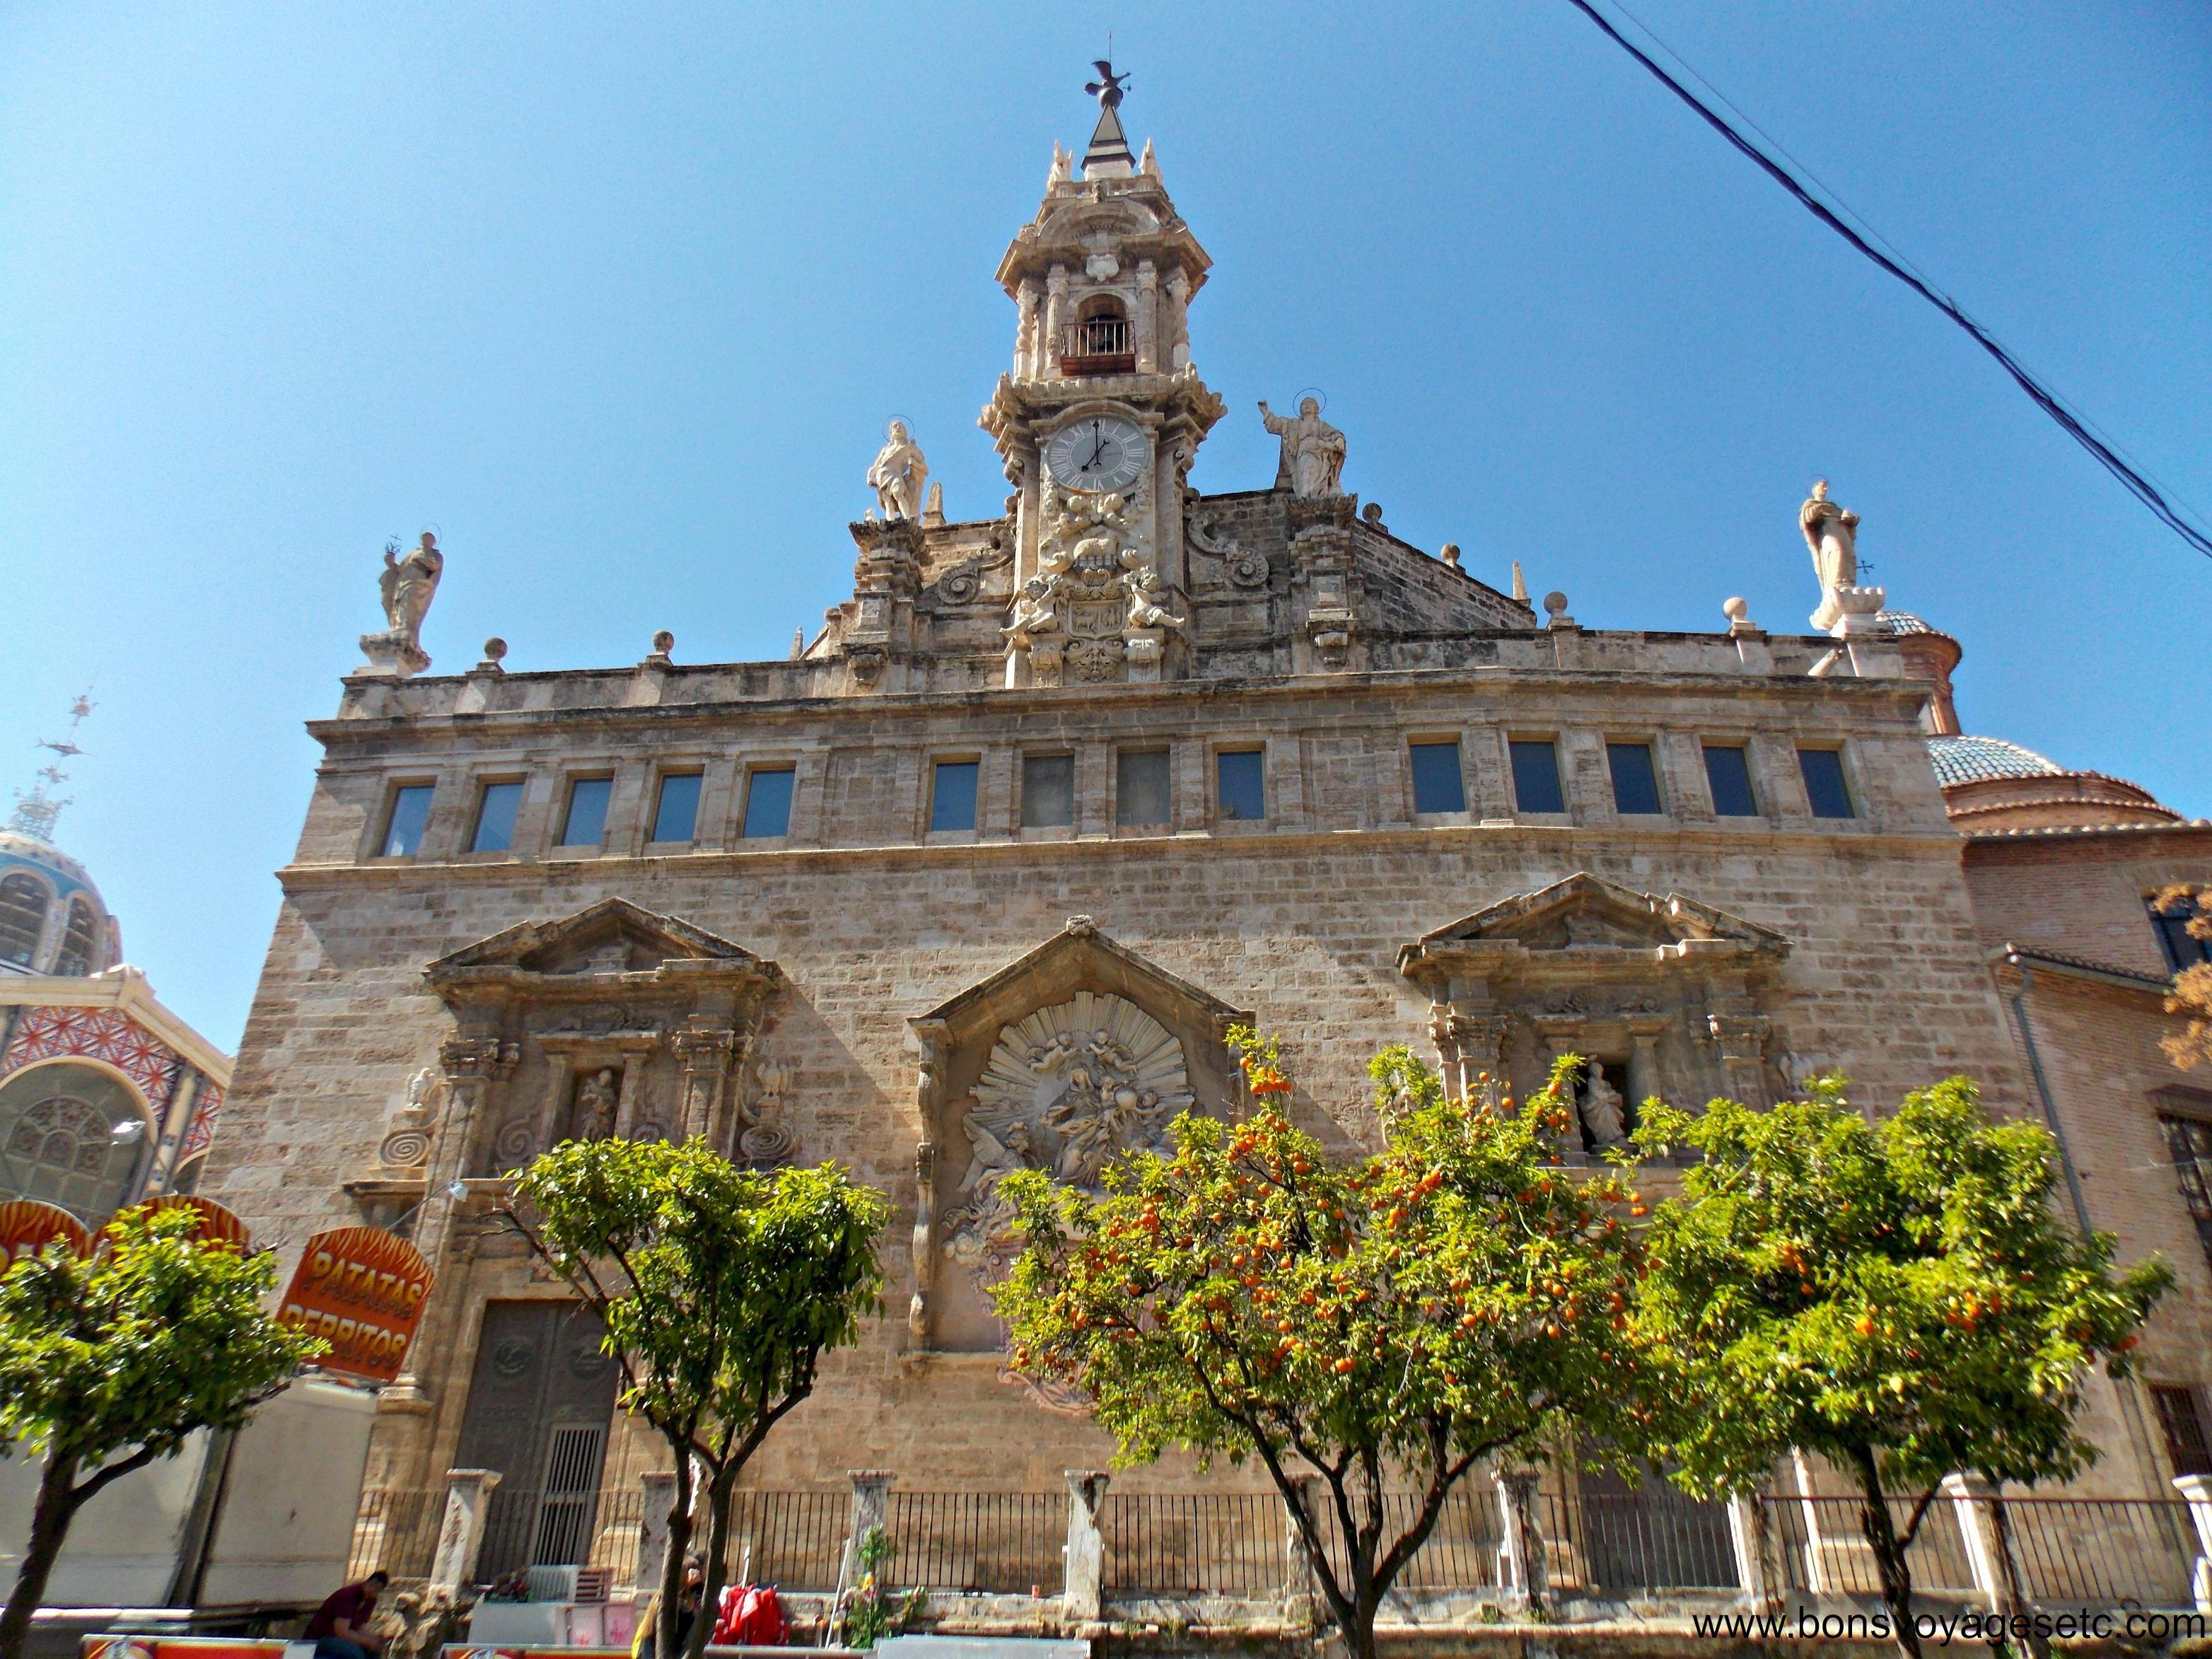 Visiter Valencia : monuments, plage et Fallas